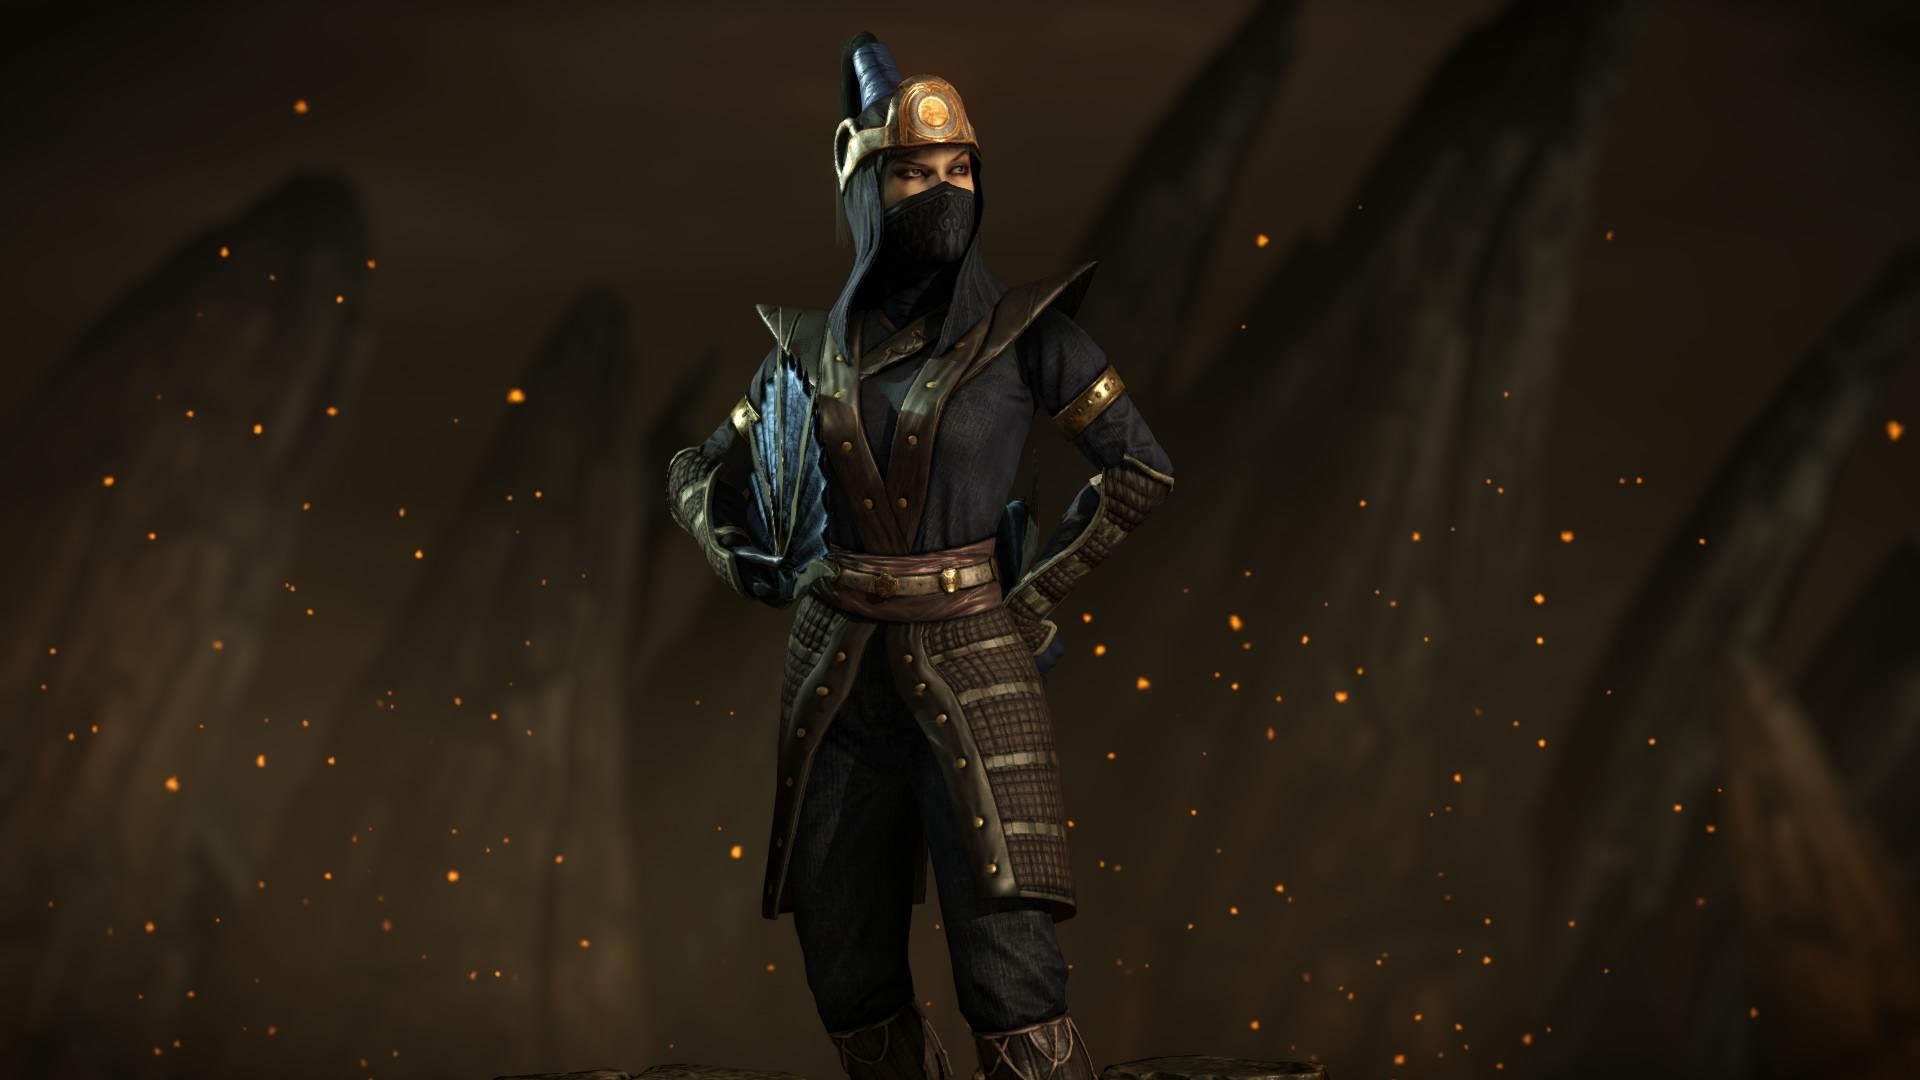 Mortal kombat x kitana jinju costume by kabukiart157 on deviantart